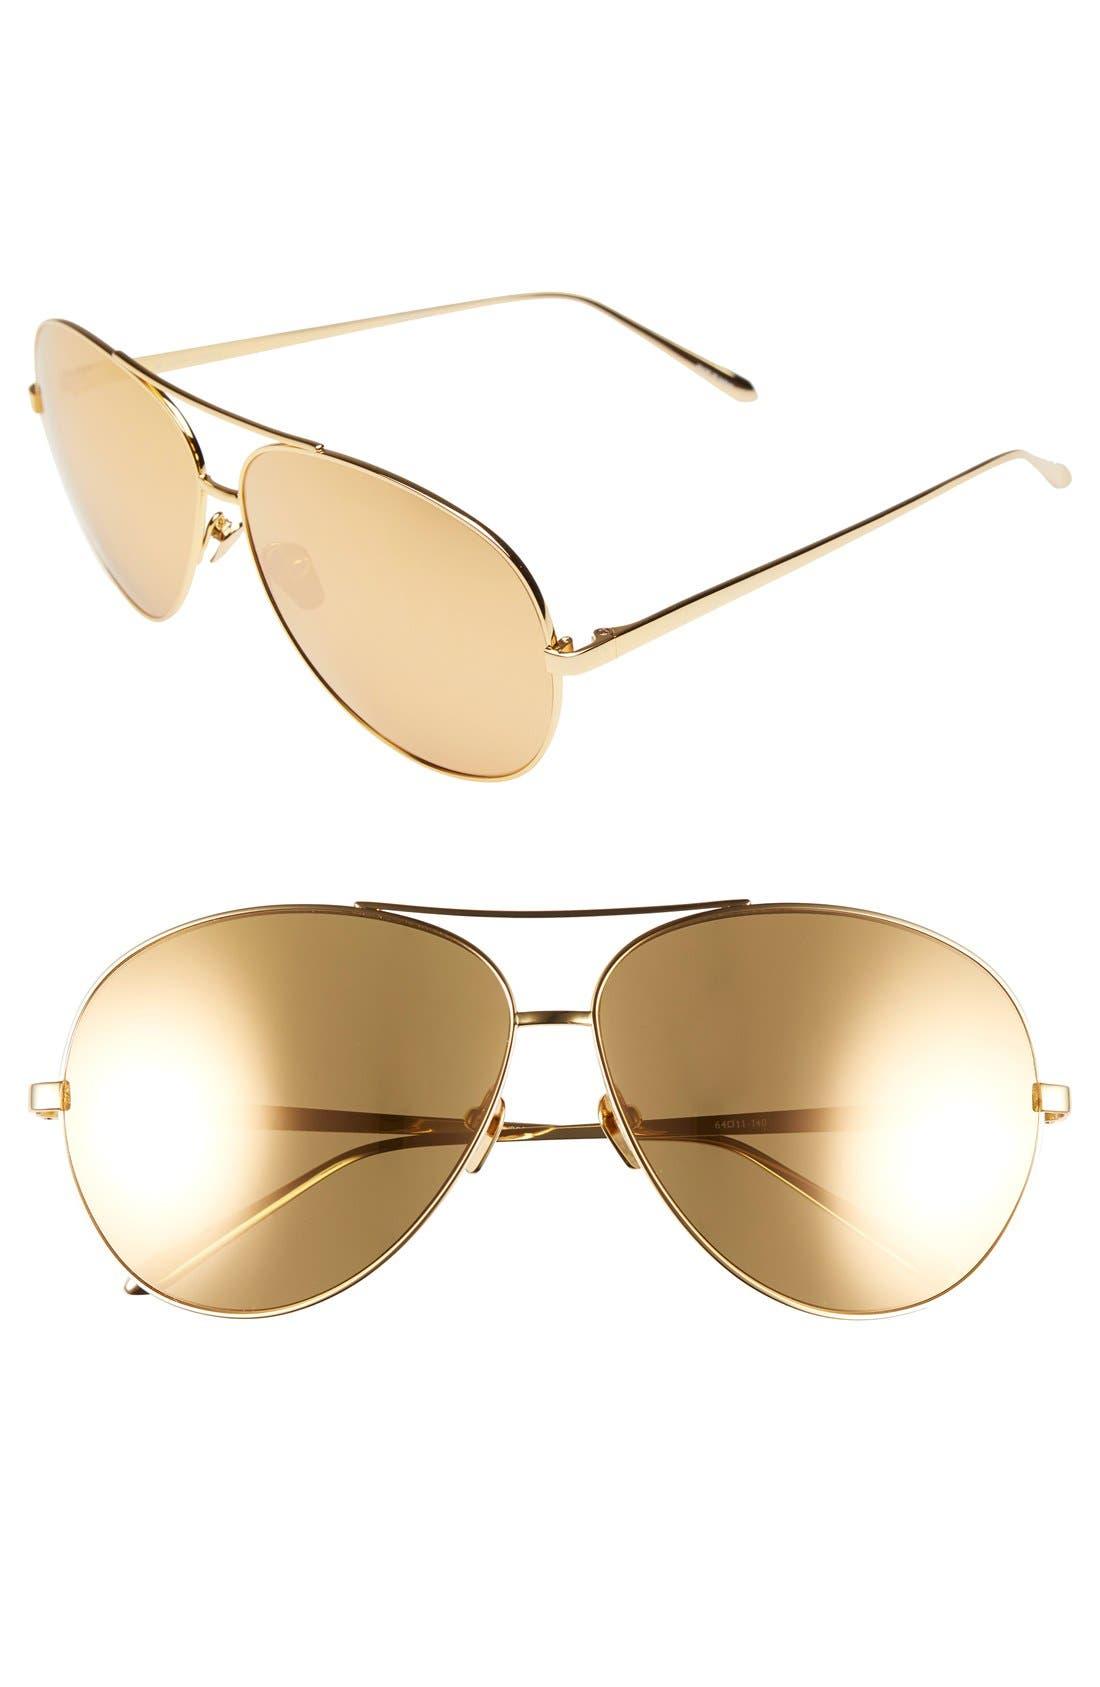 Main Image - Linda Farrow 64mm 22 Karat Gold Plated Aviator Sunglasses